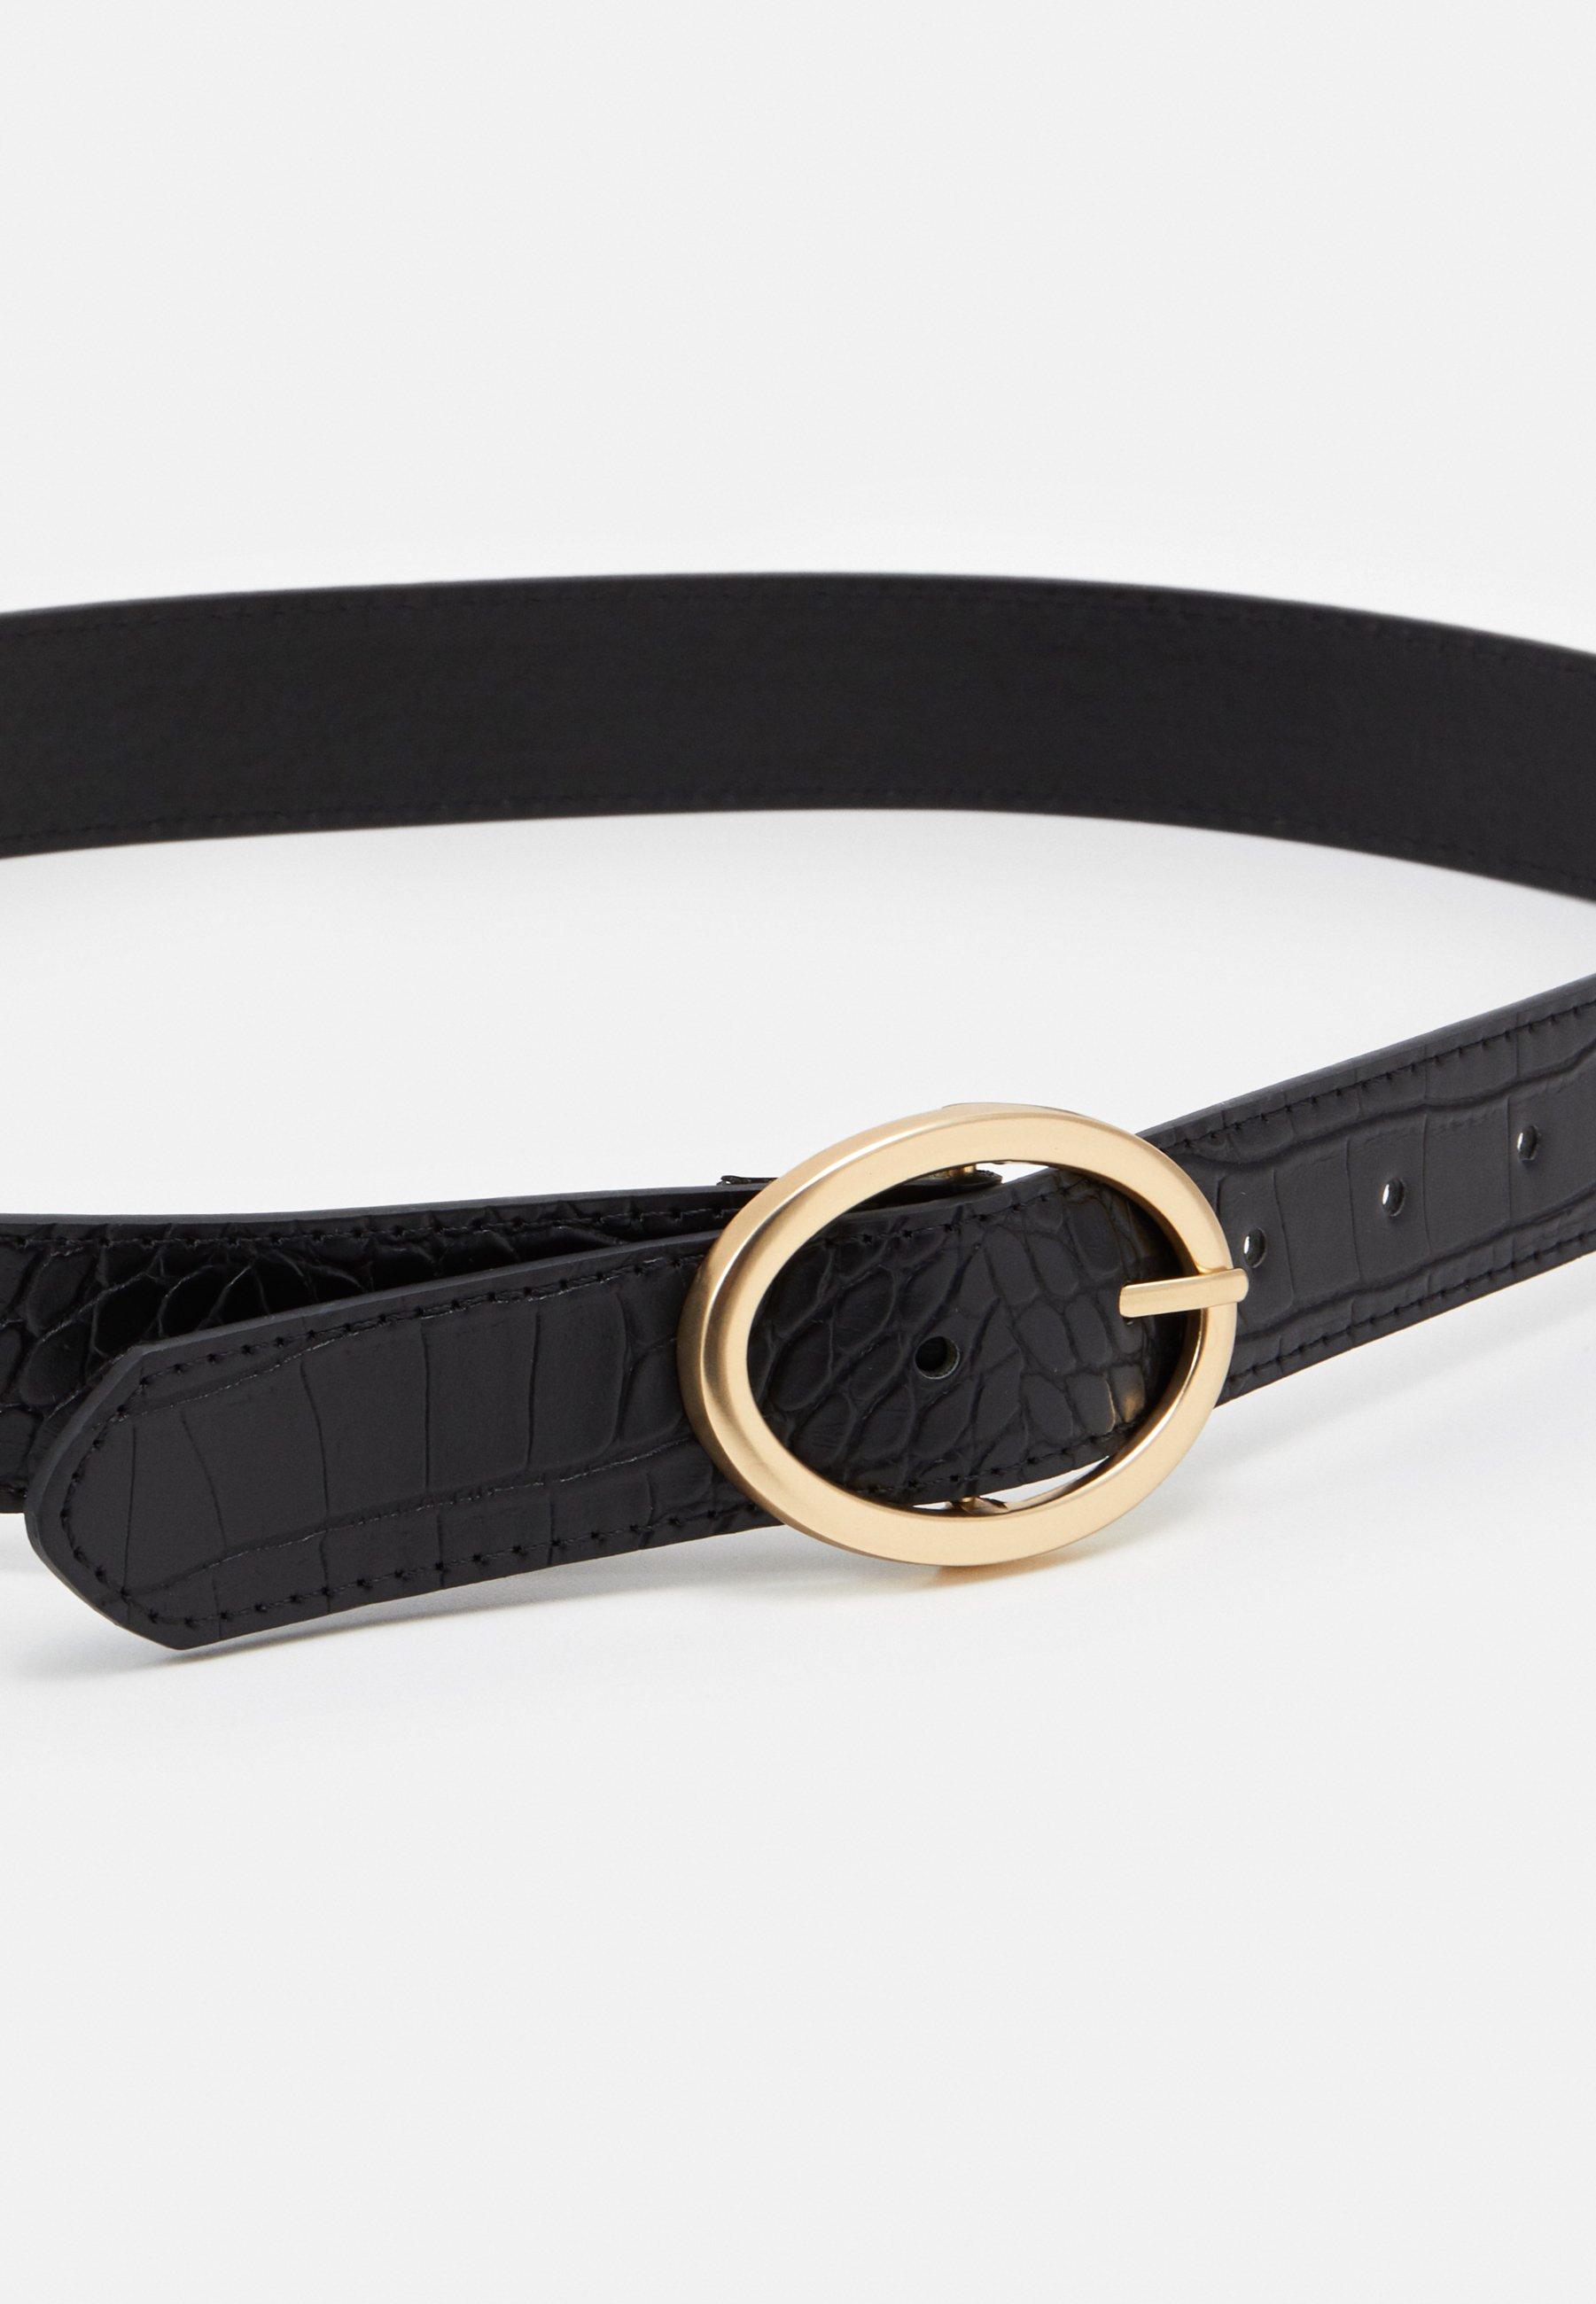 PARFOIS Belte - black/svart iKeWnsg2FpMqq20